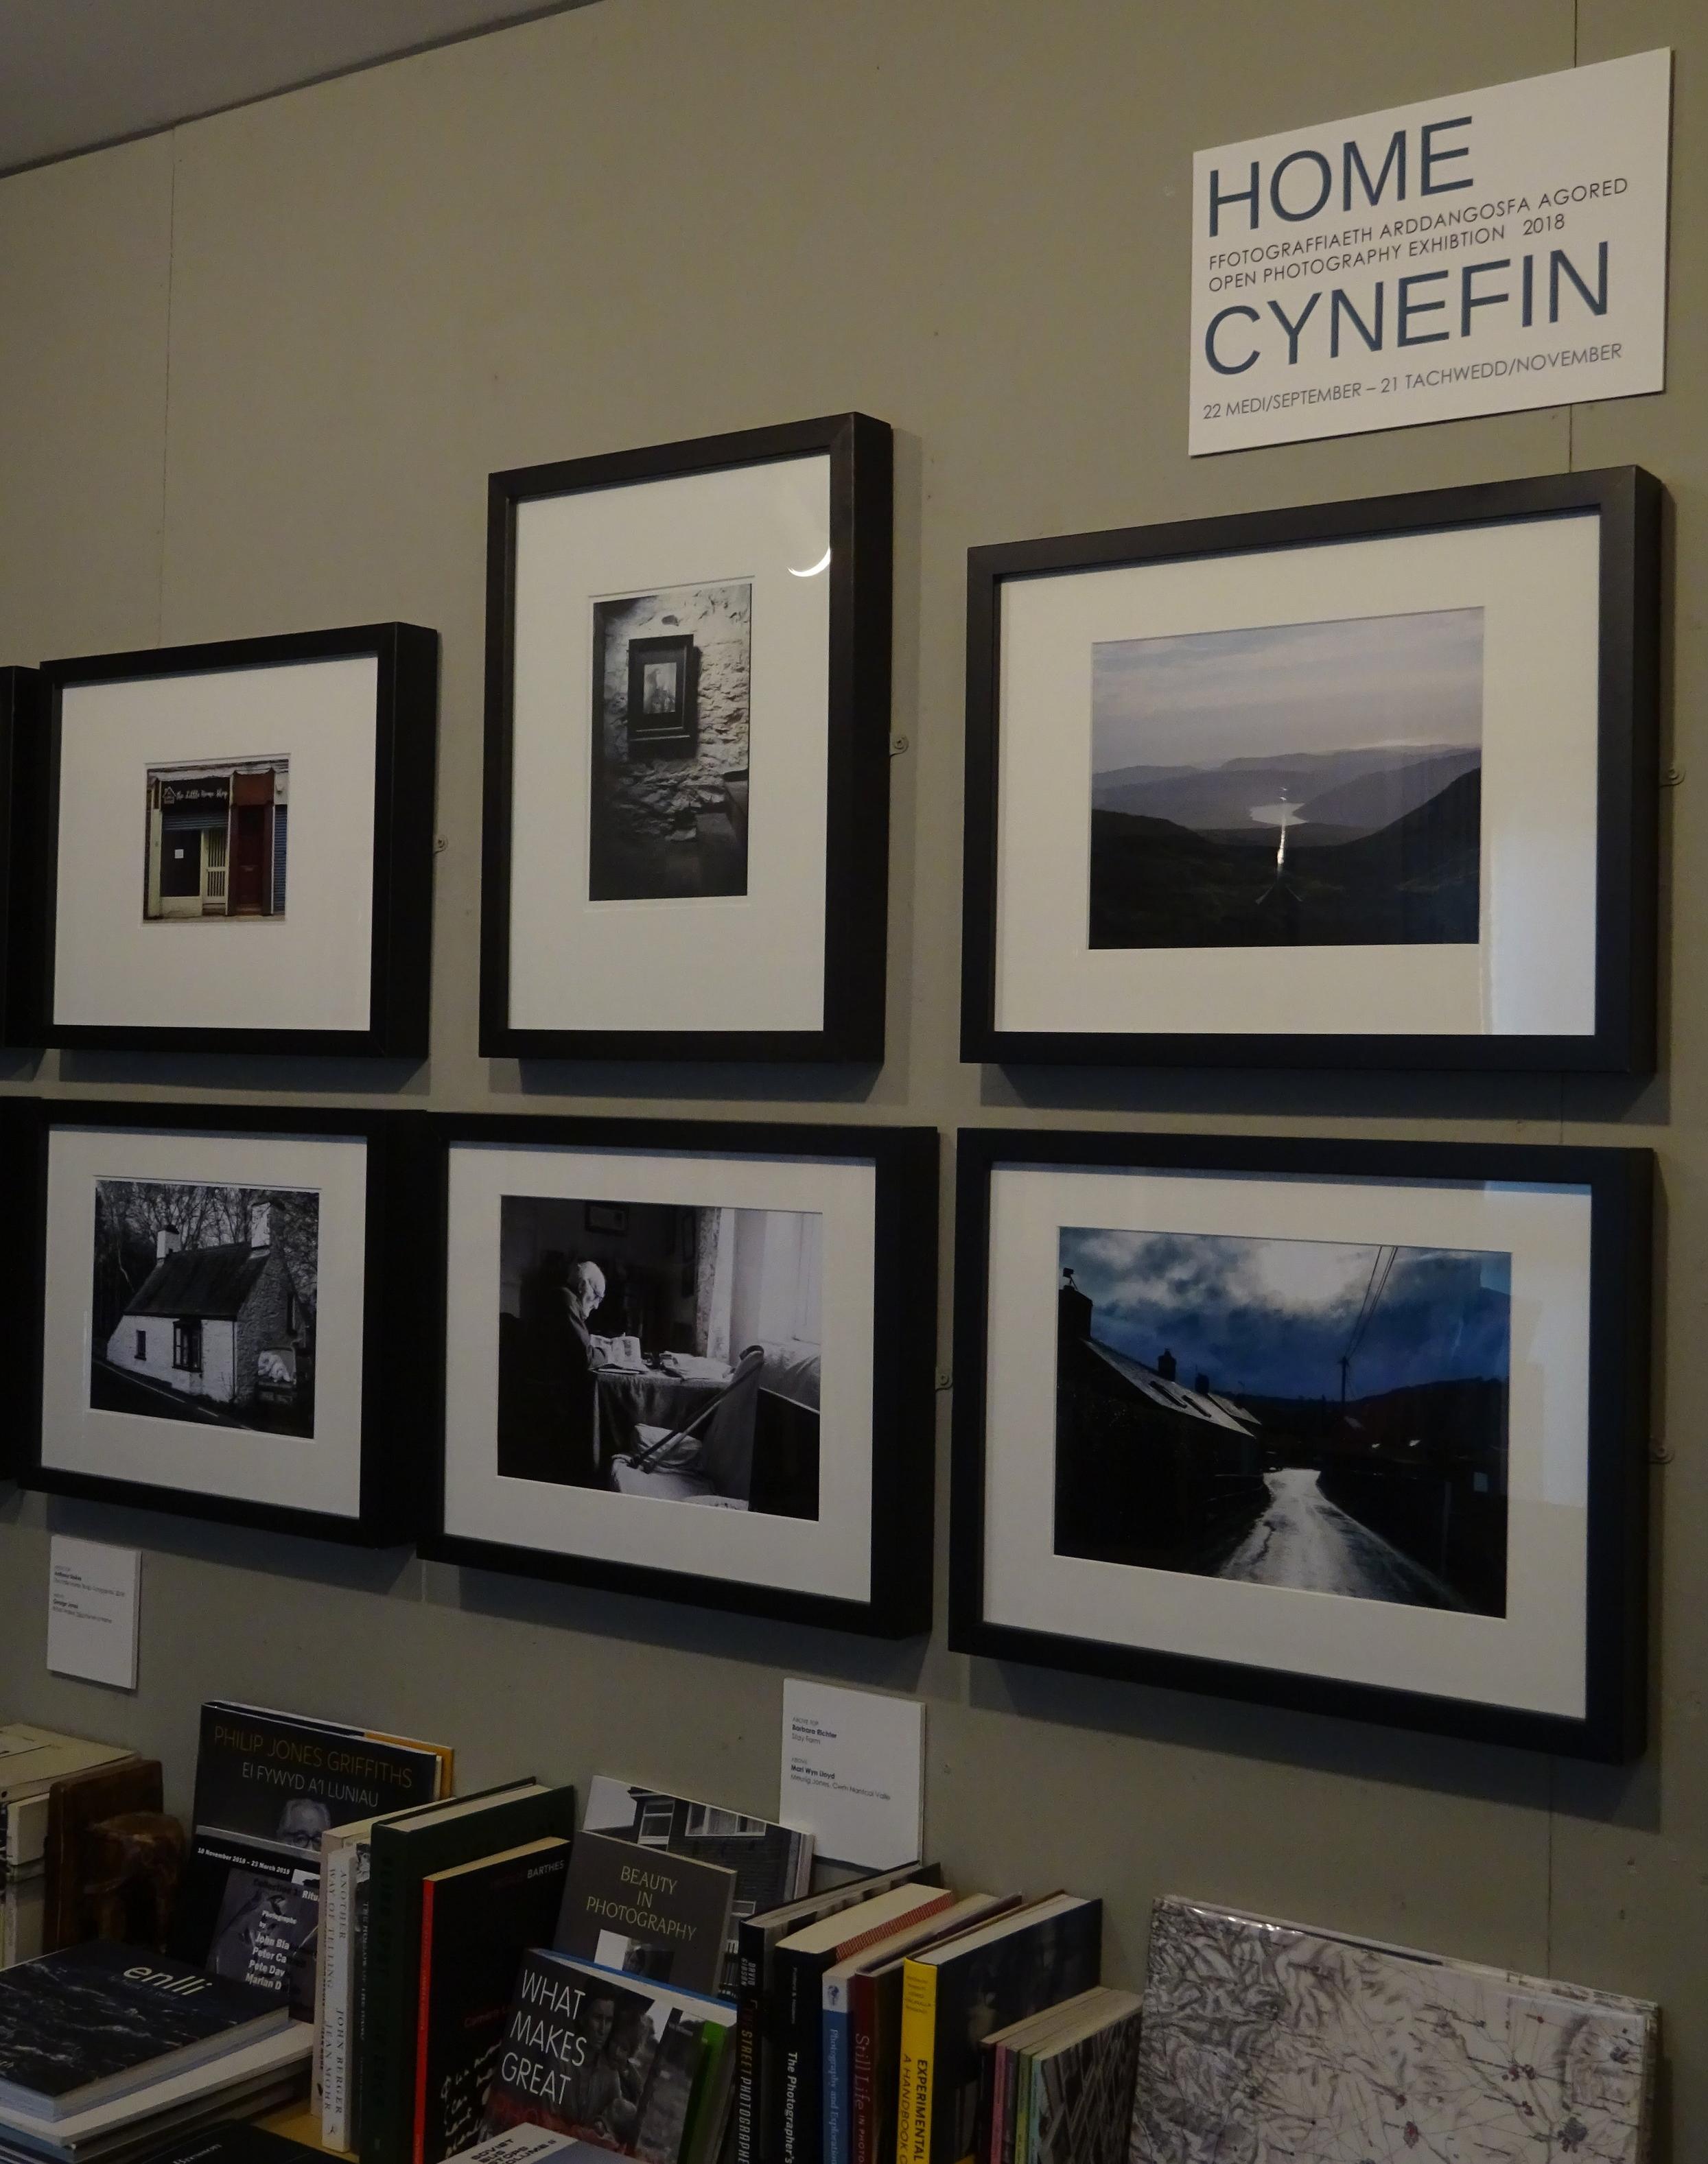 Home Cynefin10.JPG